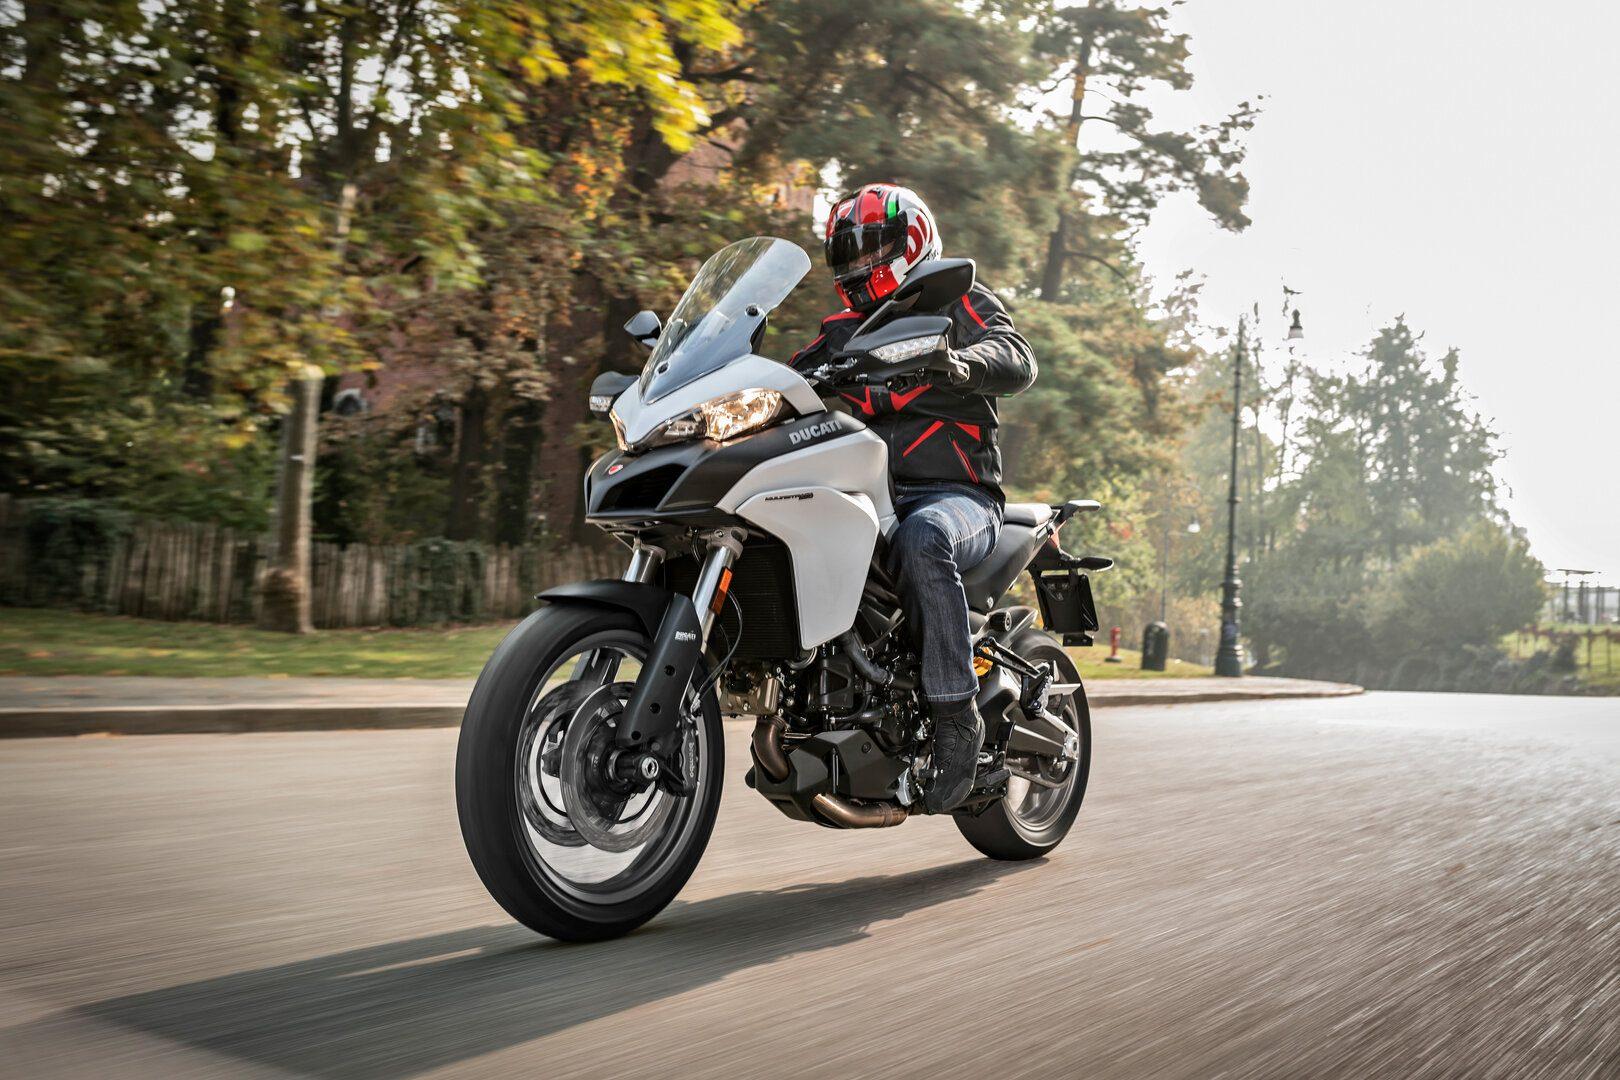 Moto del día: Buell XB9R Firebolt | espíritu RACER moto